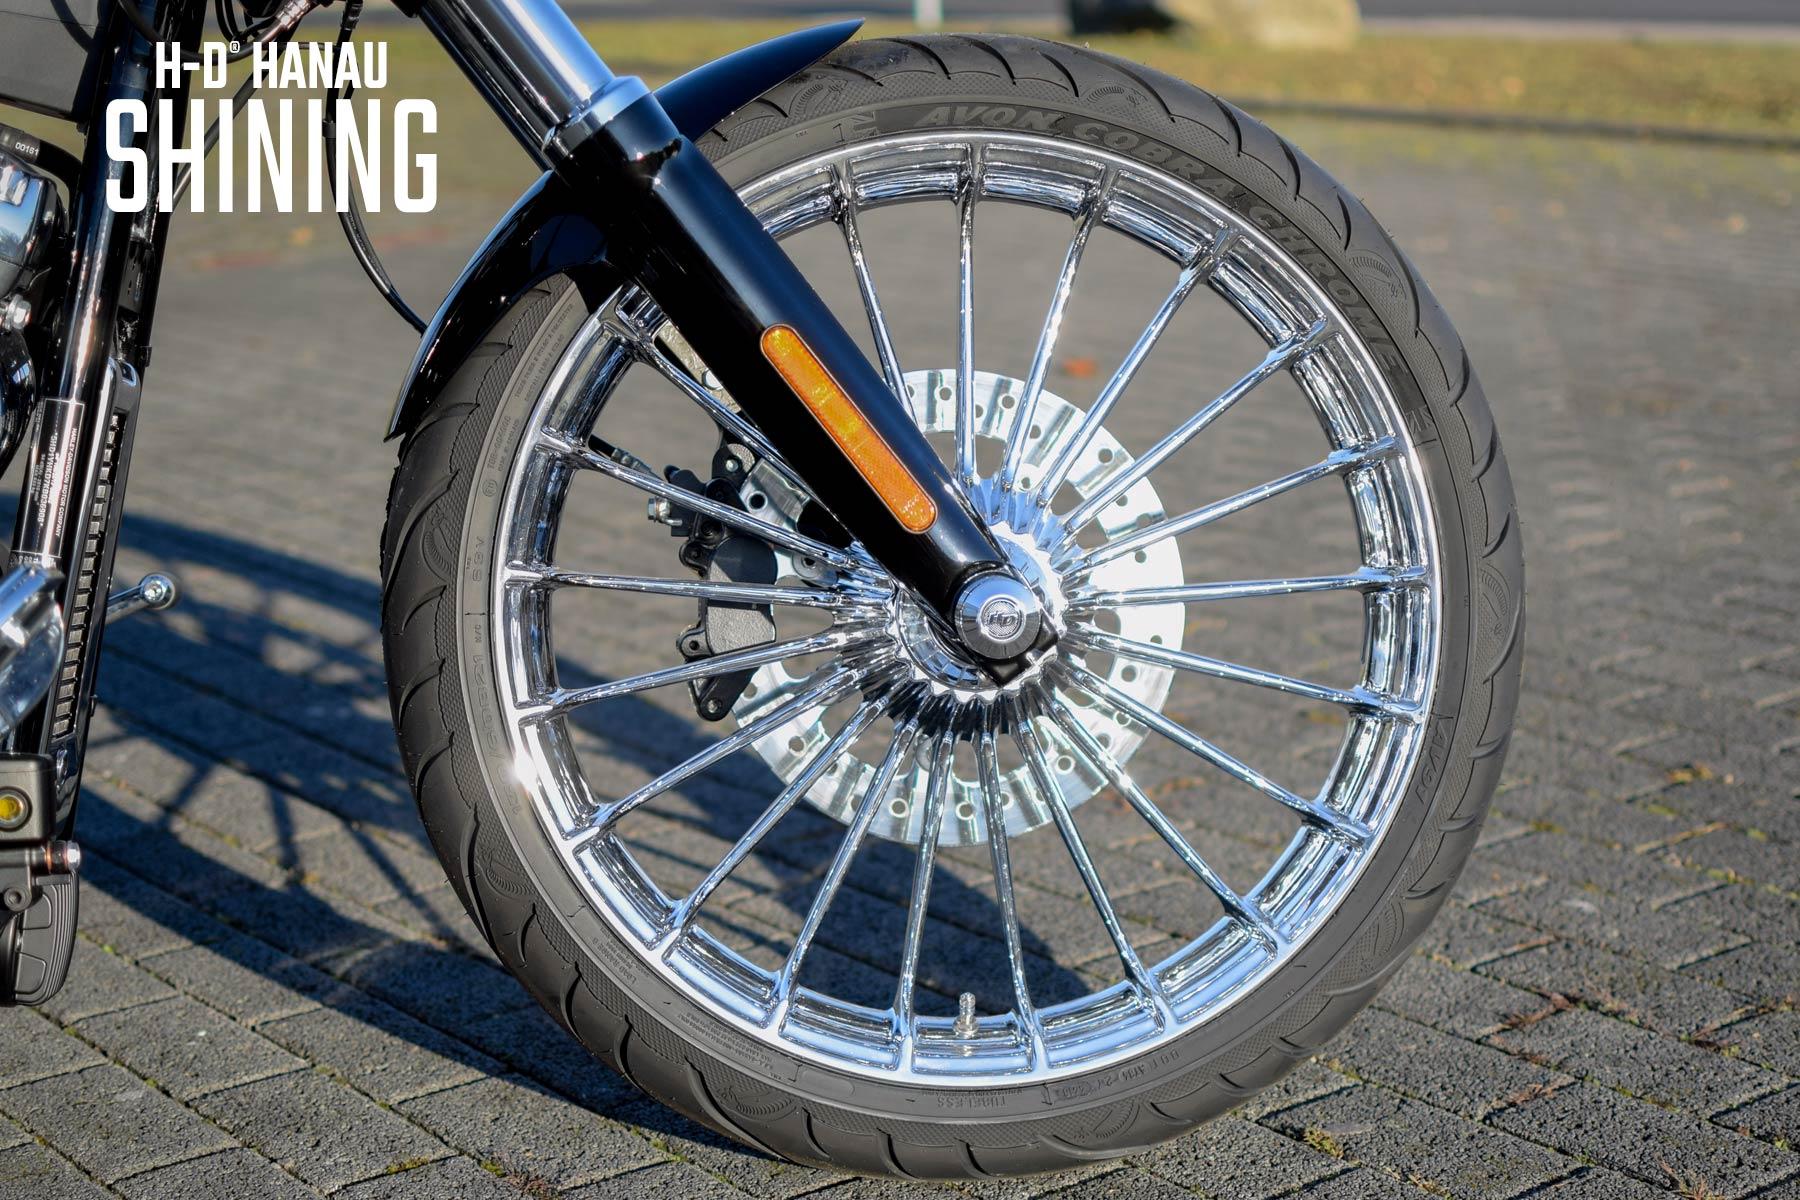 Harley-Davidson Hanau Softail Breakout Umbau Shining Custombike